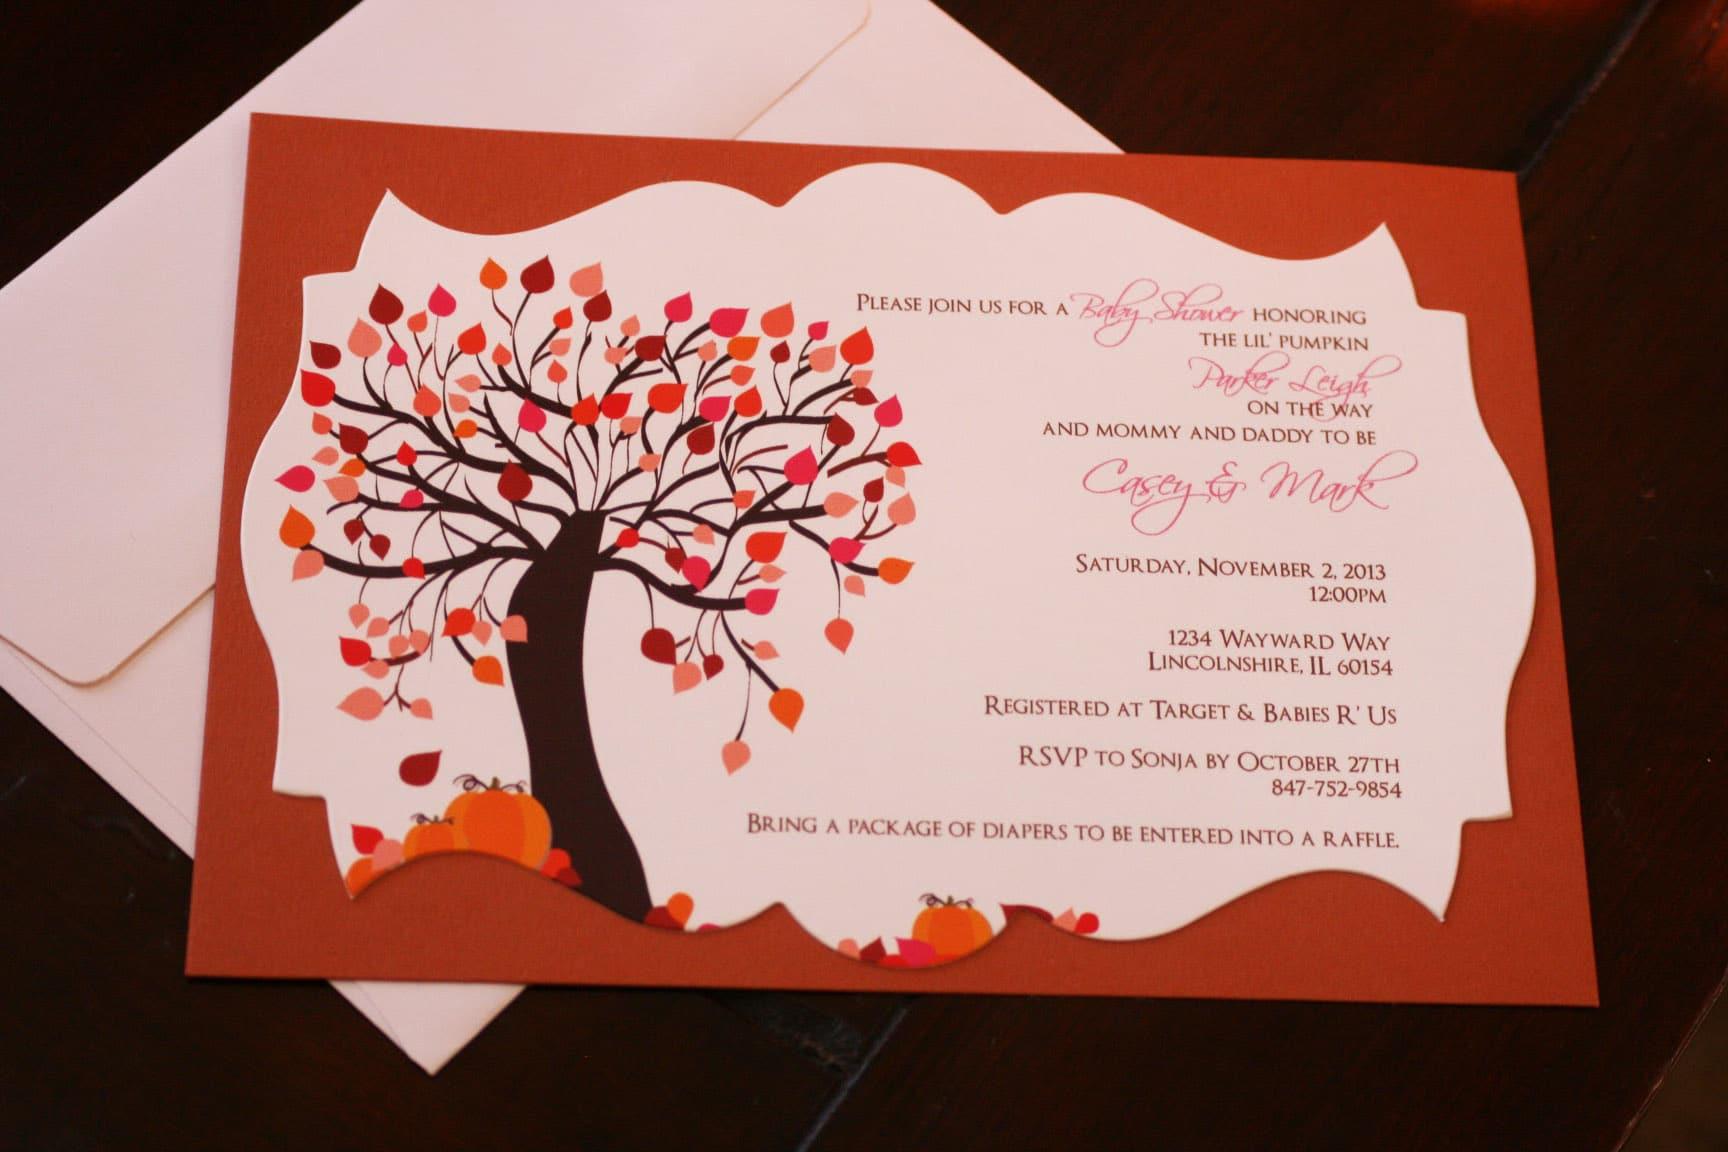 lil pumpkin baby shower invitations too chic little shab design